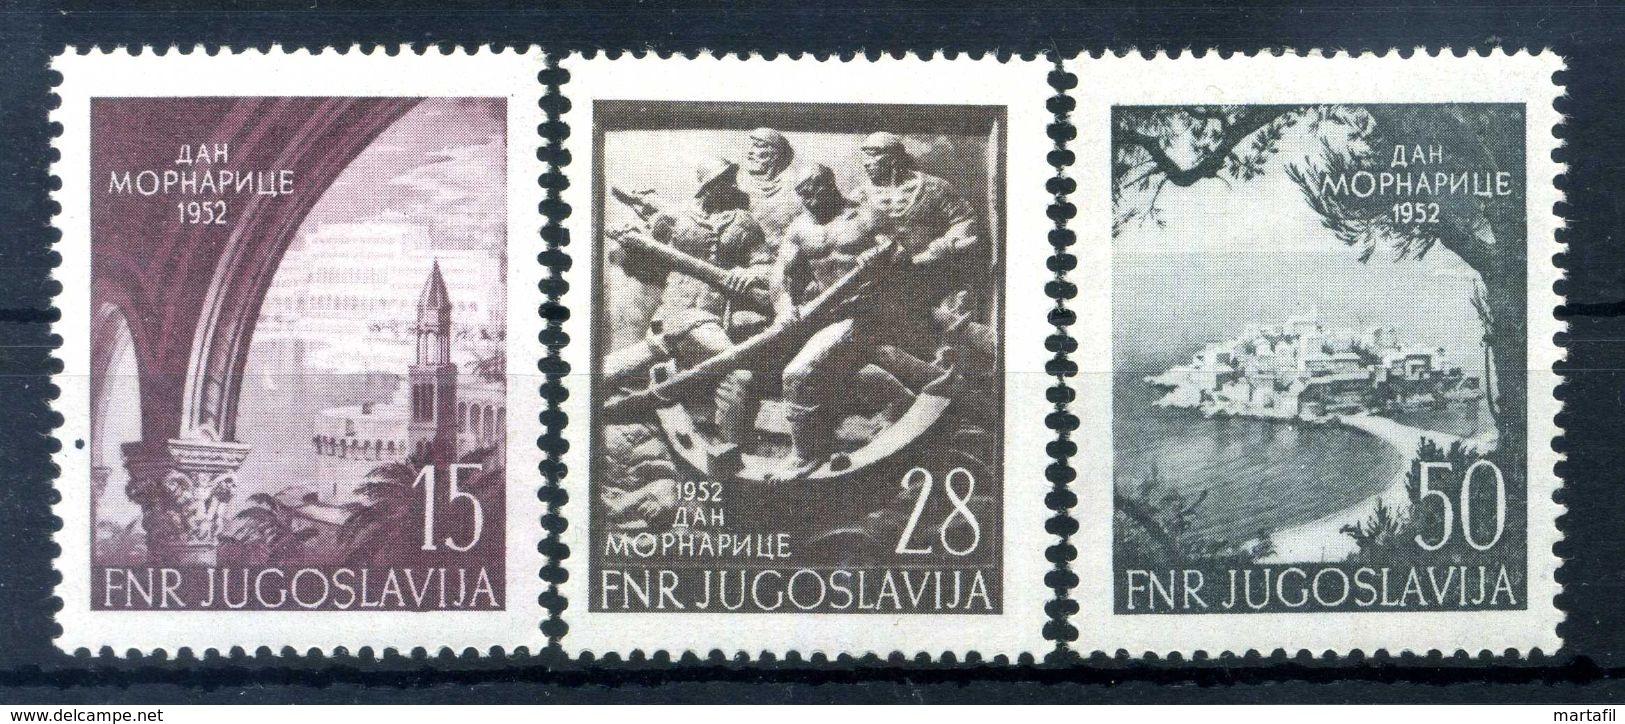 1952 JUGOSLAVIA SET MNH ** - 1945-1992 Repubblica Socialista Federale Di Jugoslavia